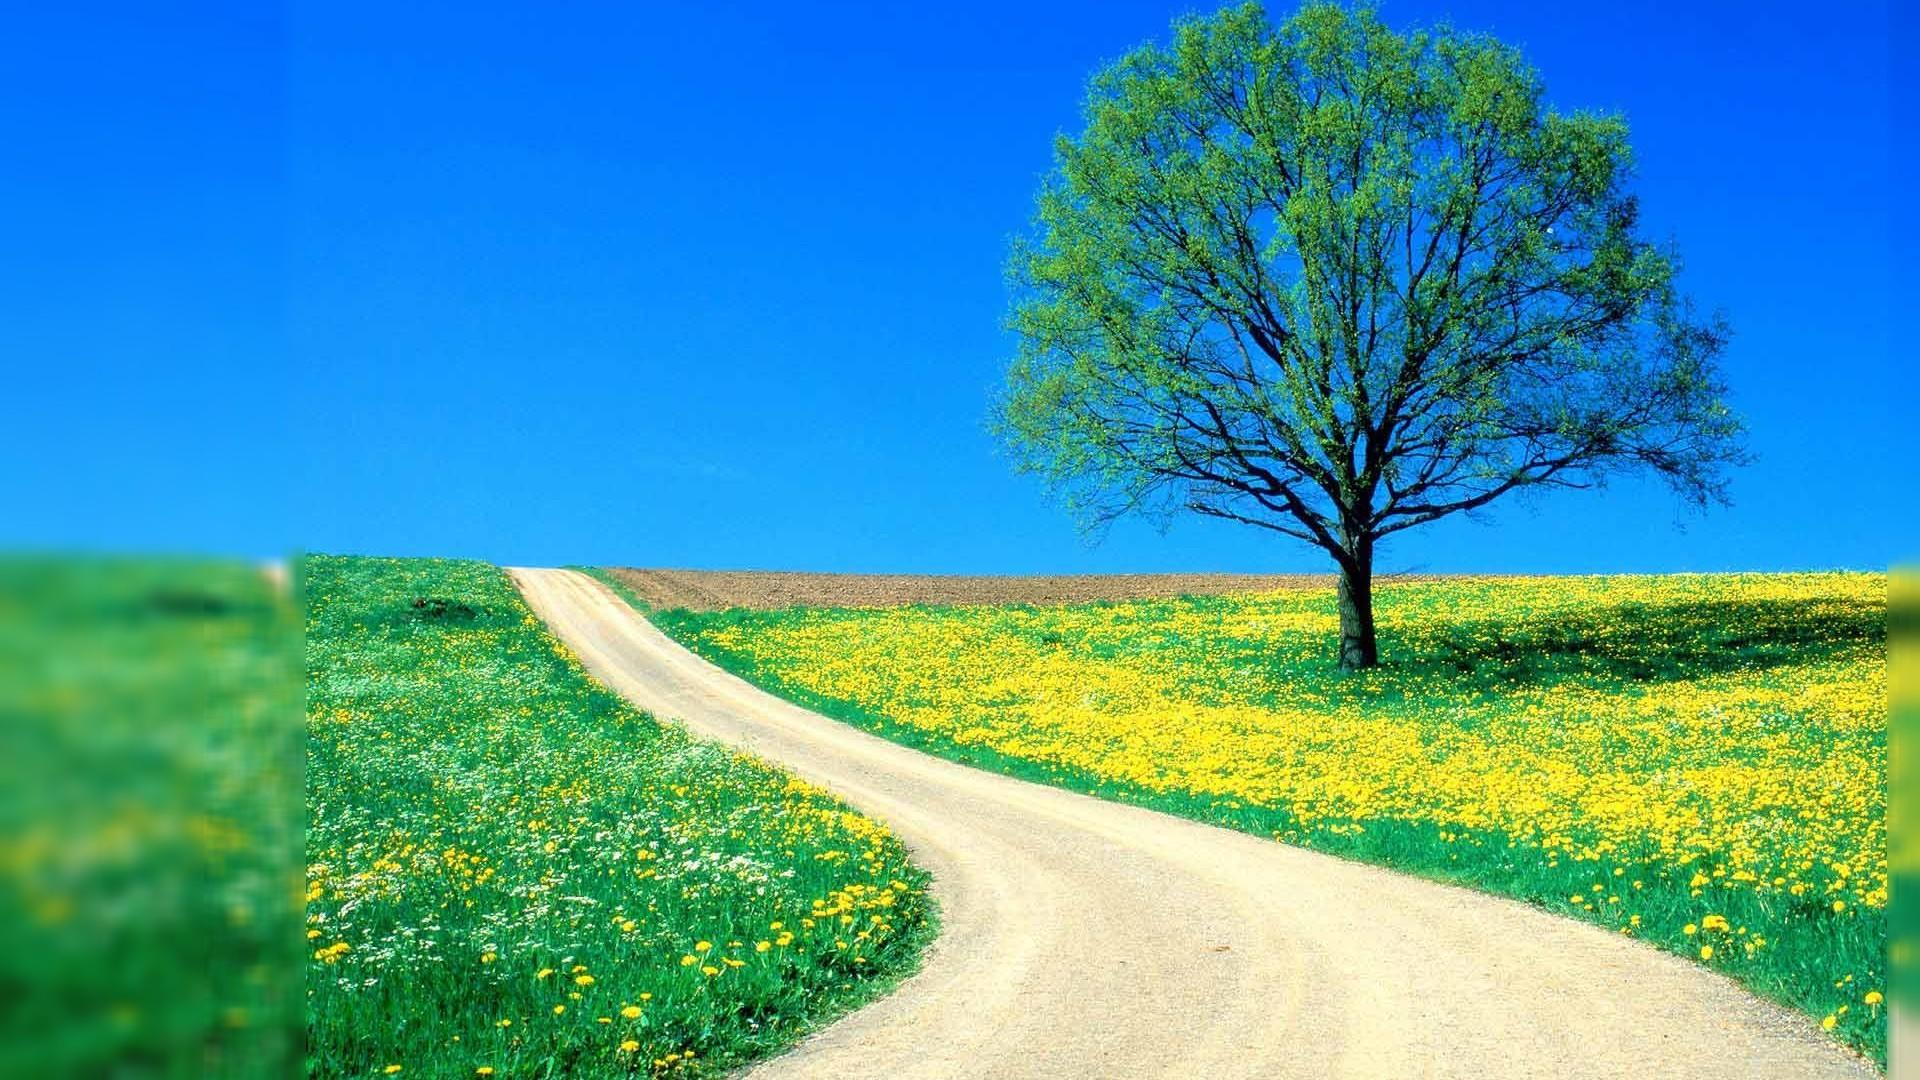 Nature Wallpapers Desktop Download HD #5765 Wallpaper | ESWALLS.